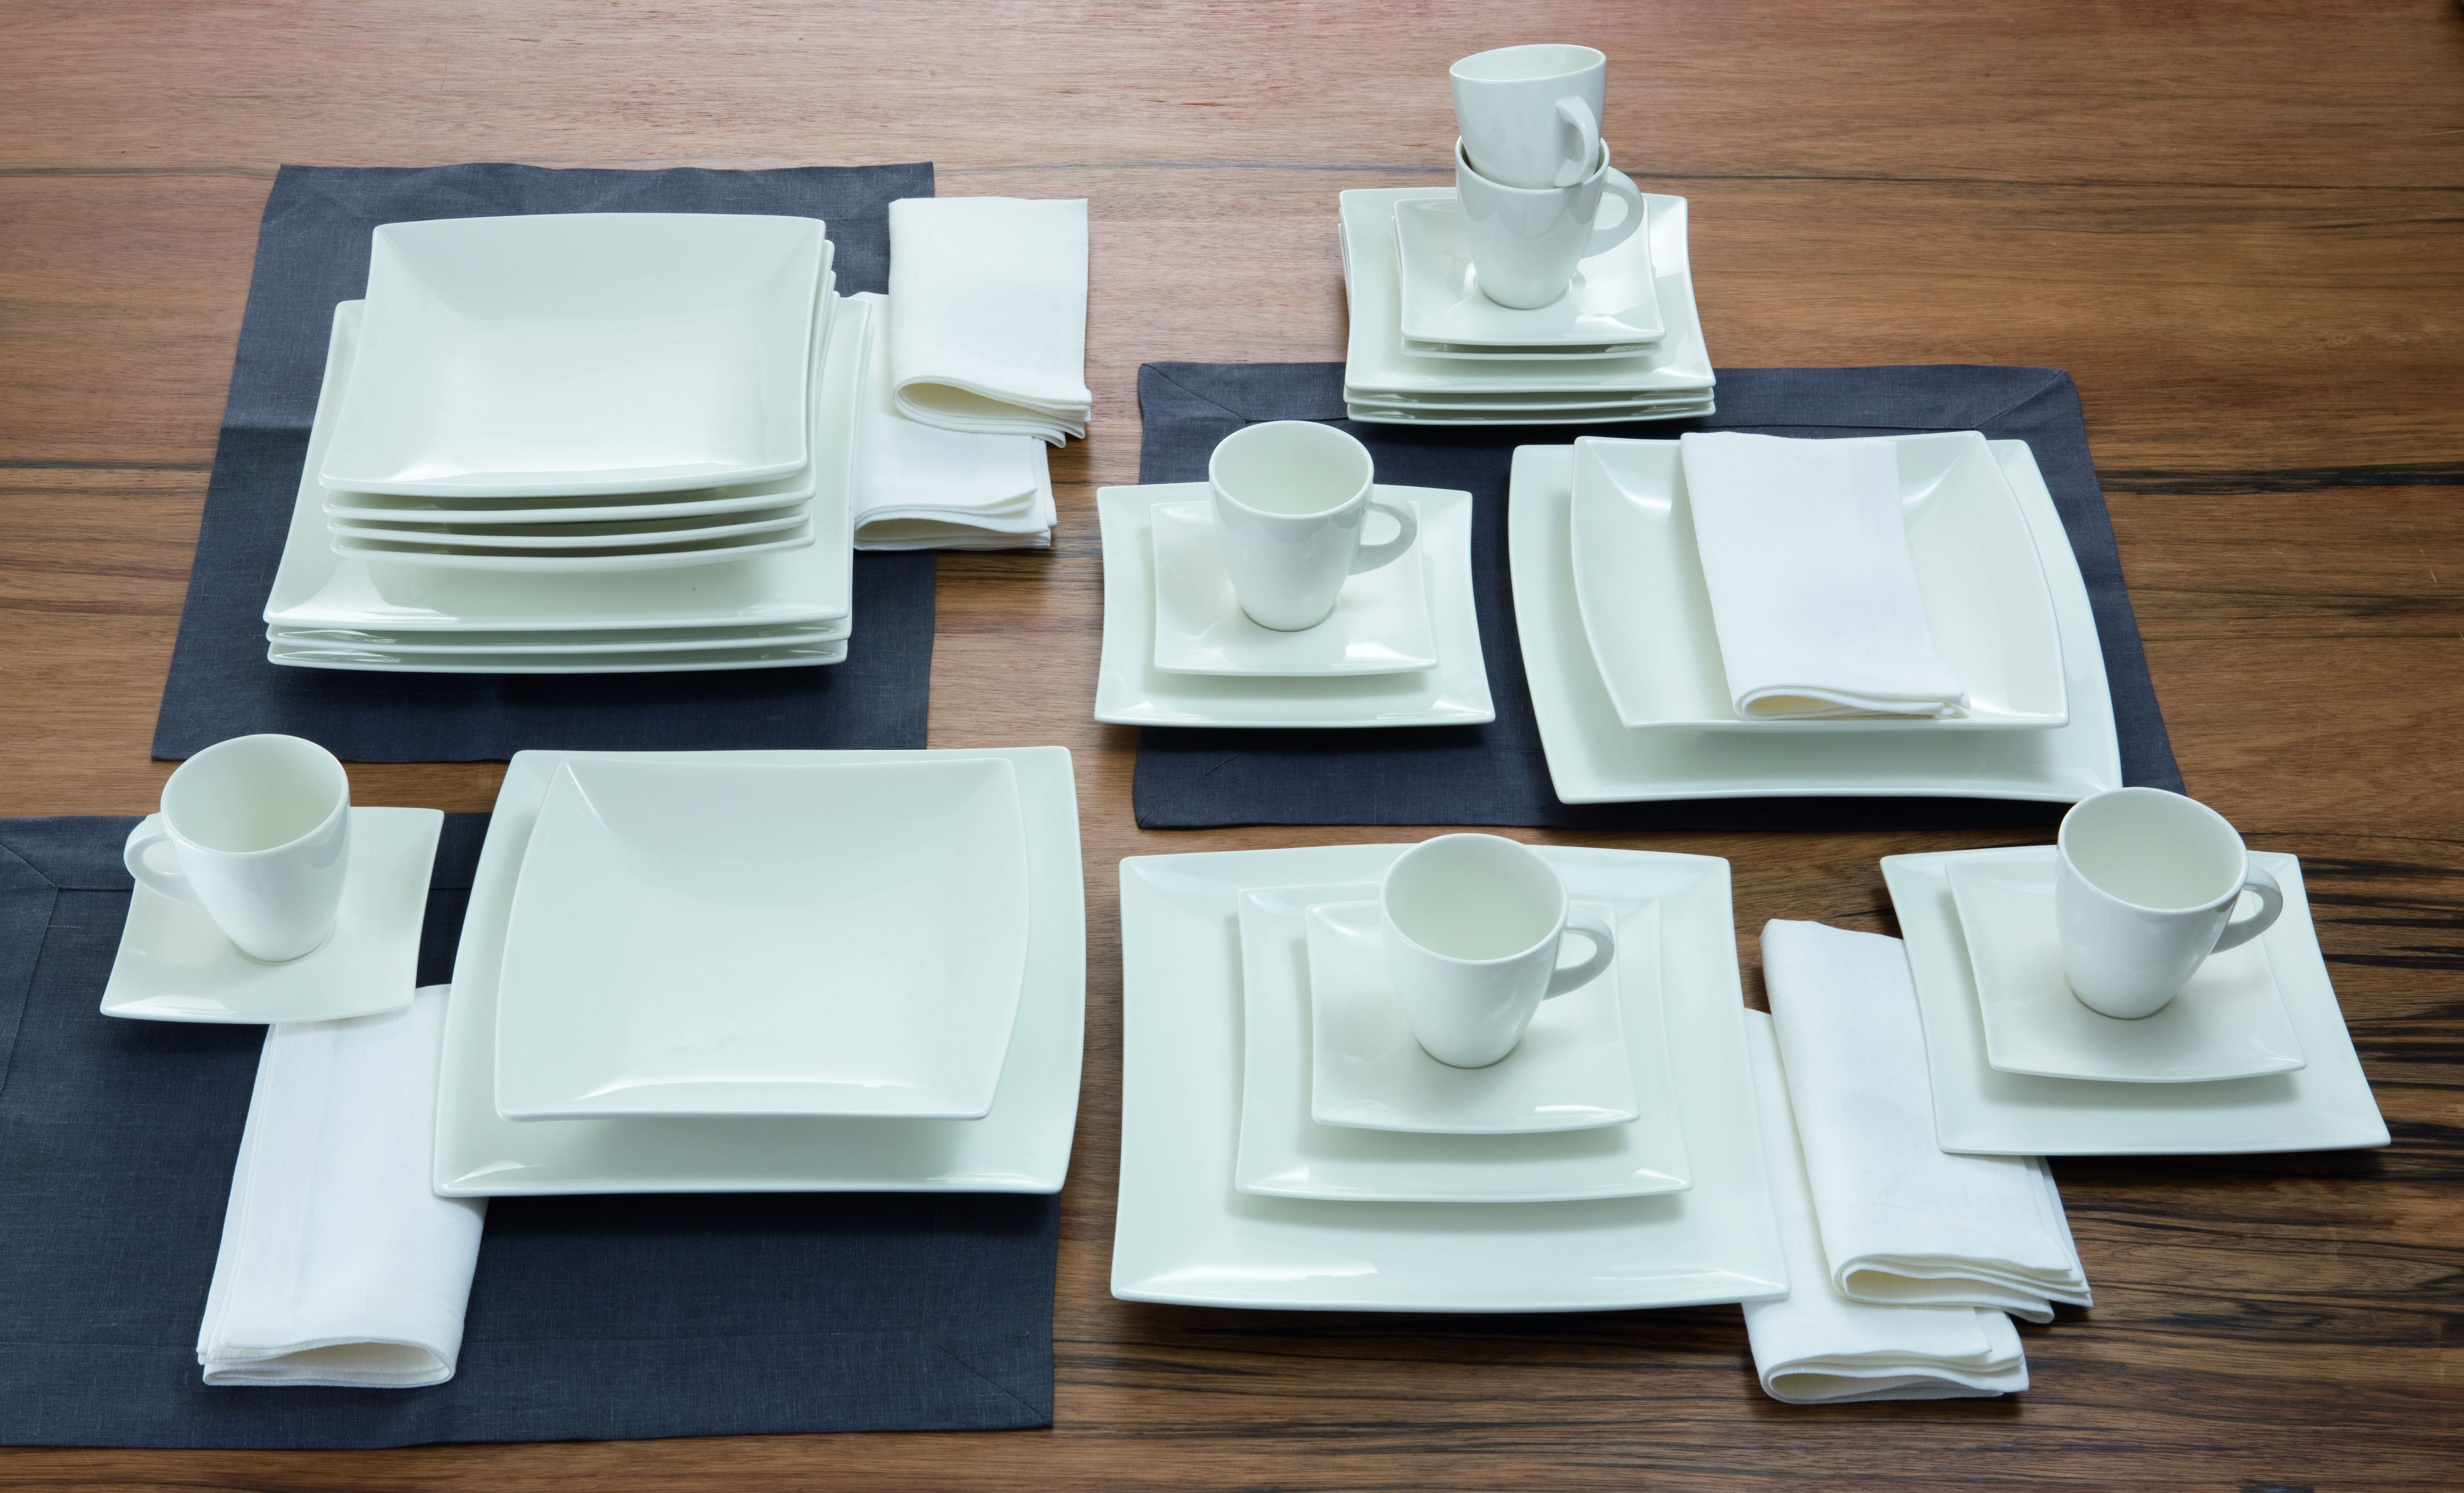 maxwell williams diep bord vierkant east meets west. Black Bedroom Furniture Sets. Home Design Ideas